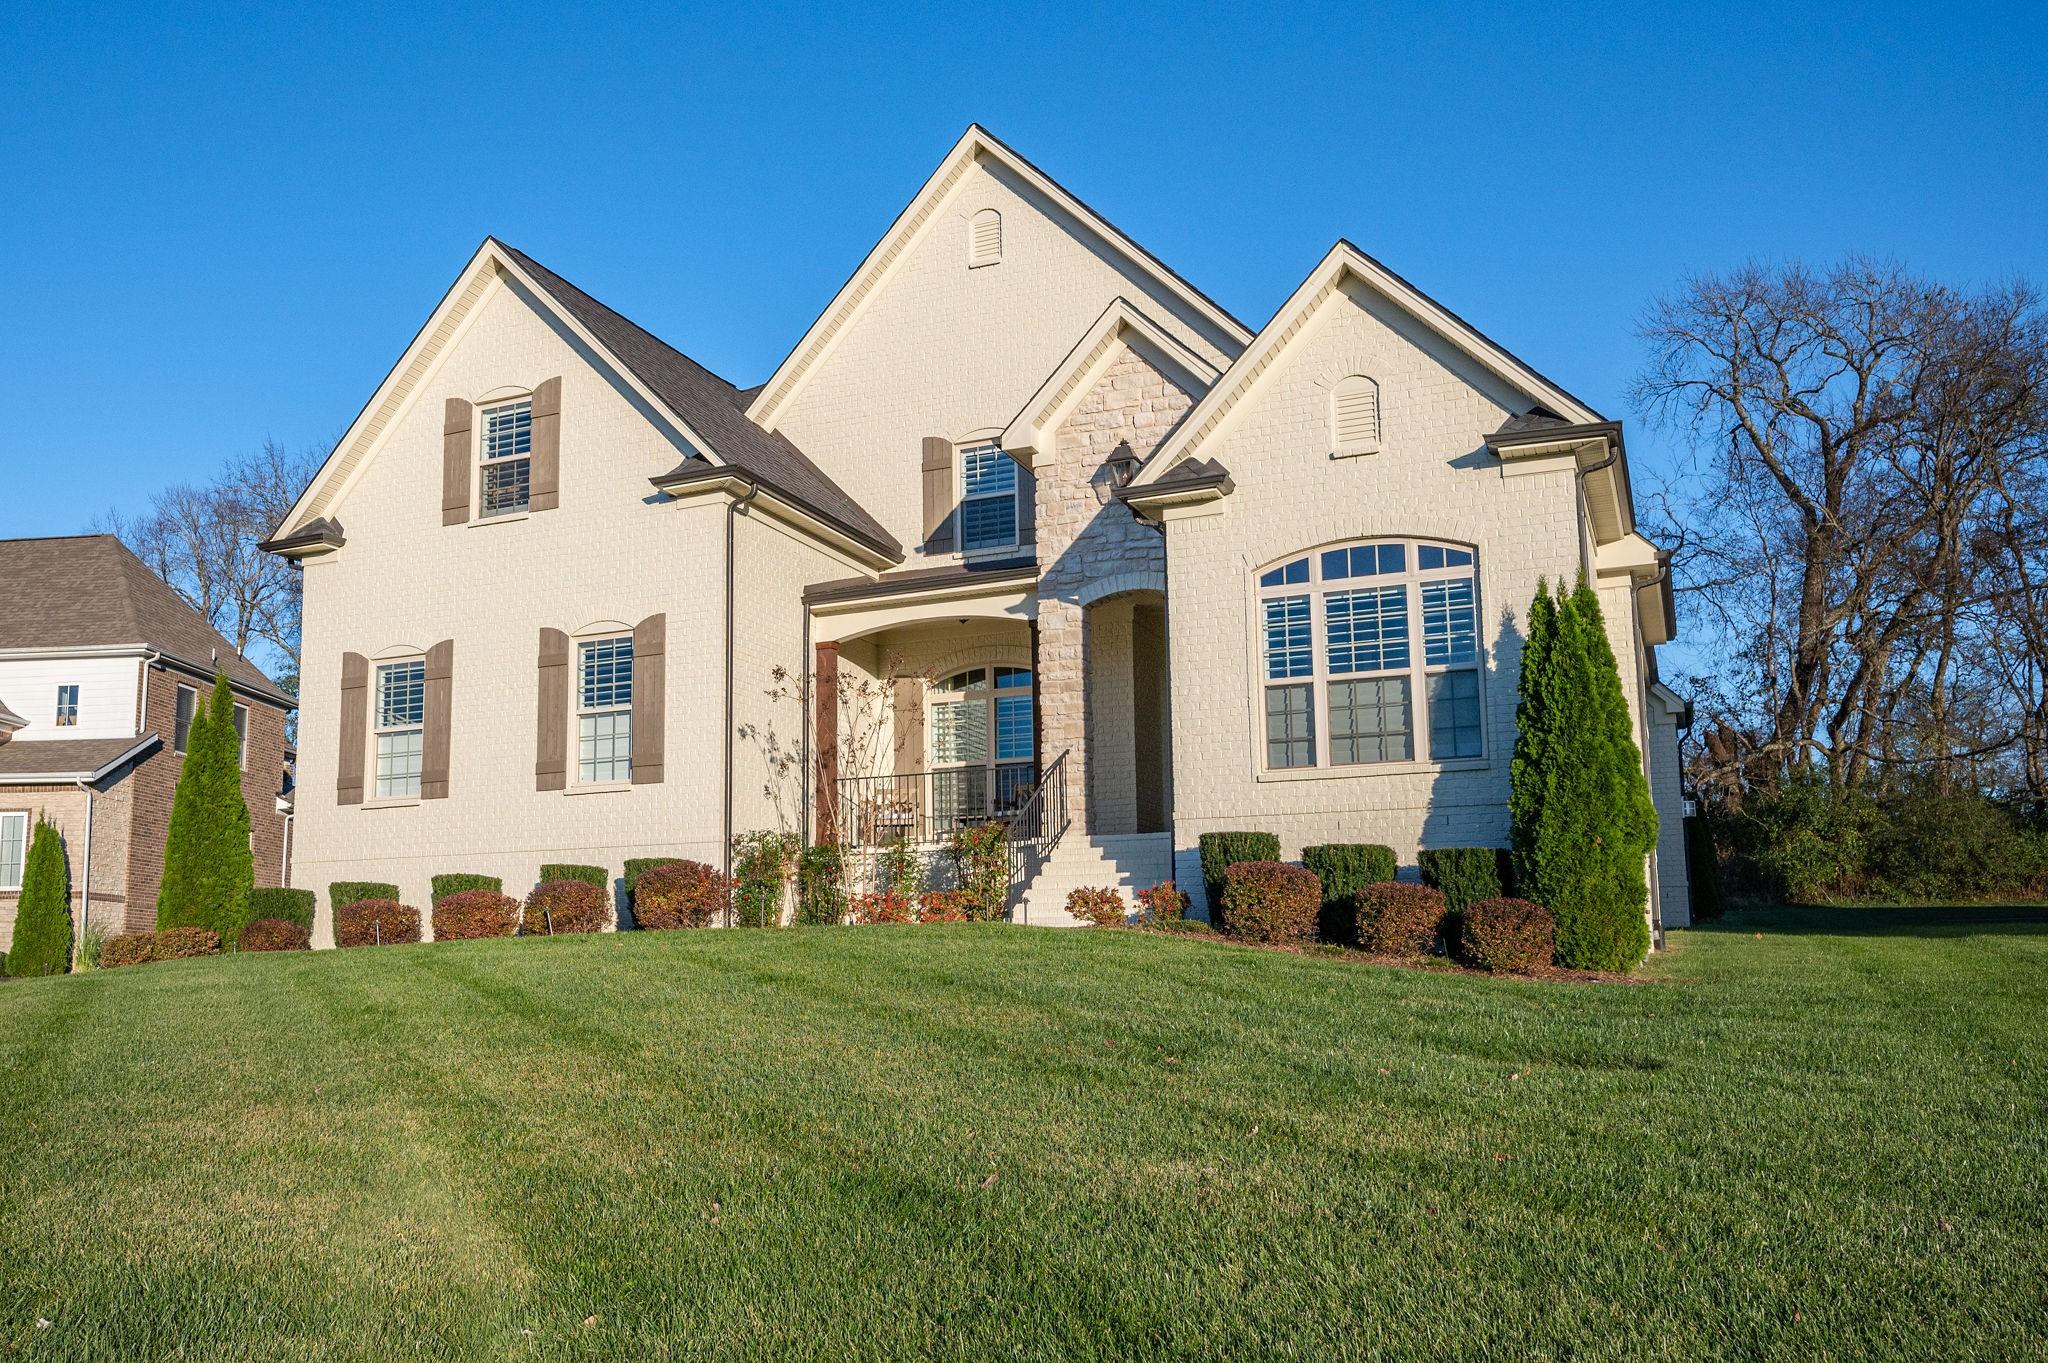 4171 Old Light Cir Property Photo - Arrington, TN real estate listing